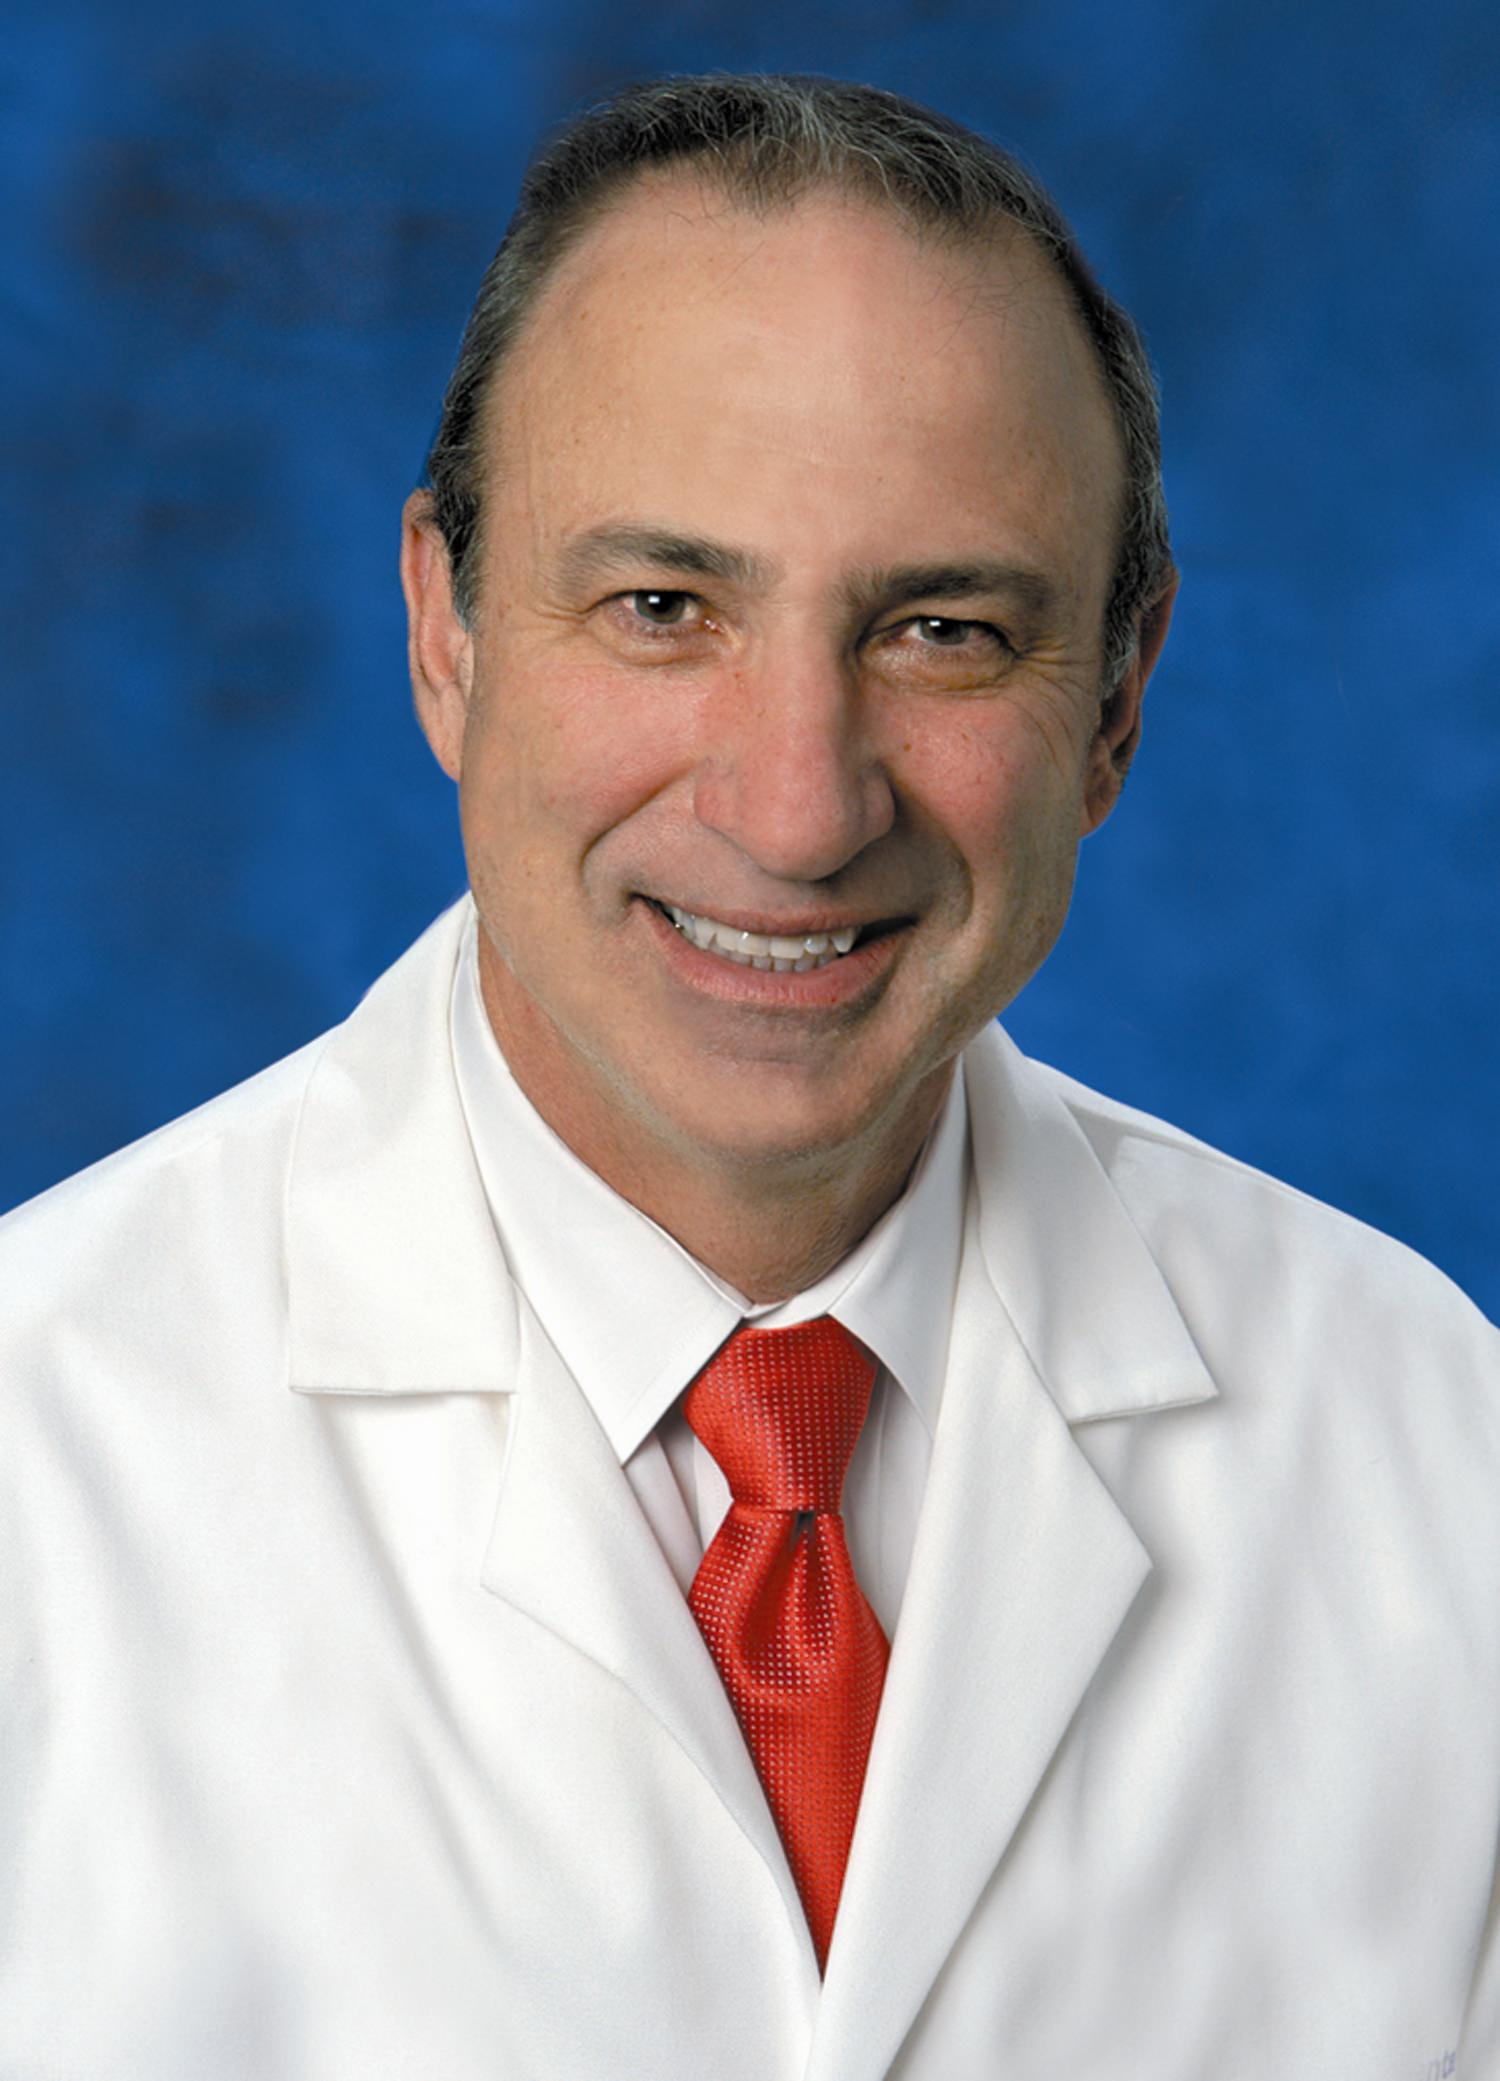 Armando Sardi, M.D., FACS